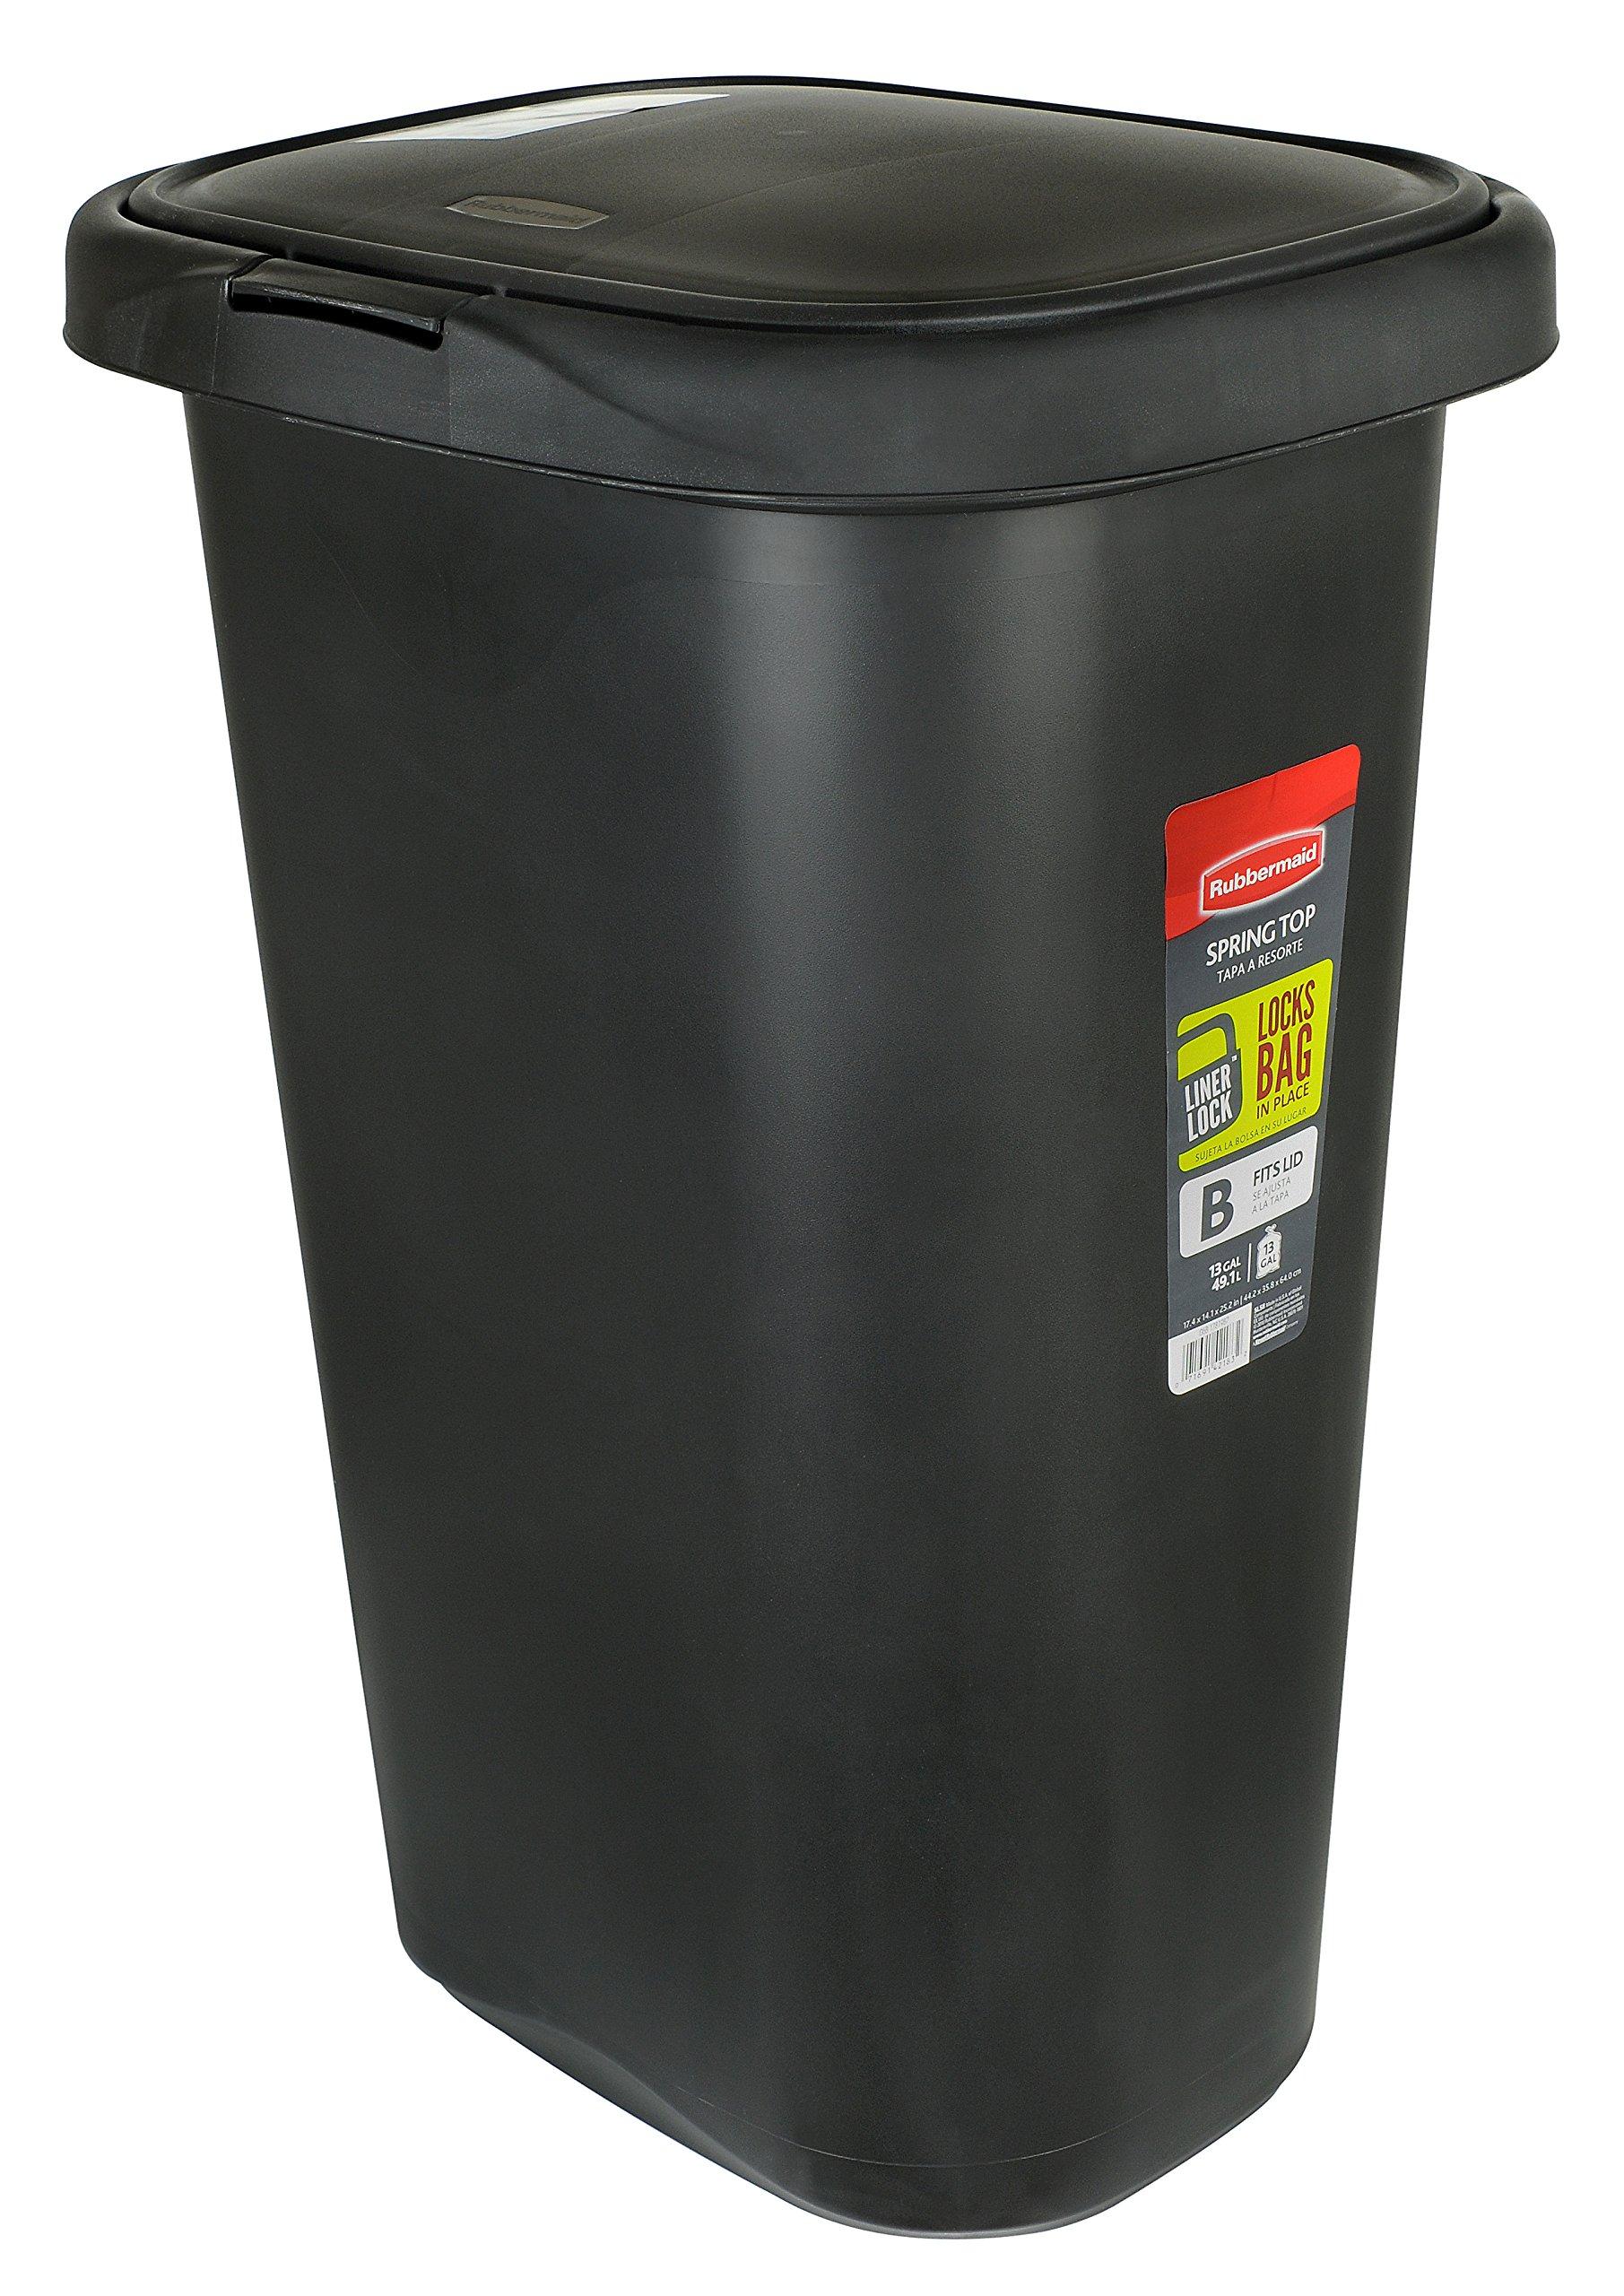 Rubbermaid FG233900WHT Spring Top Wastebasket, 53-Quart, 13 1/4 Gallon, Black